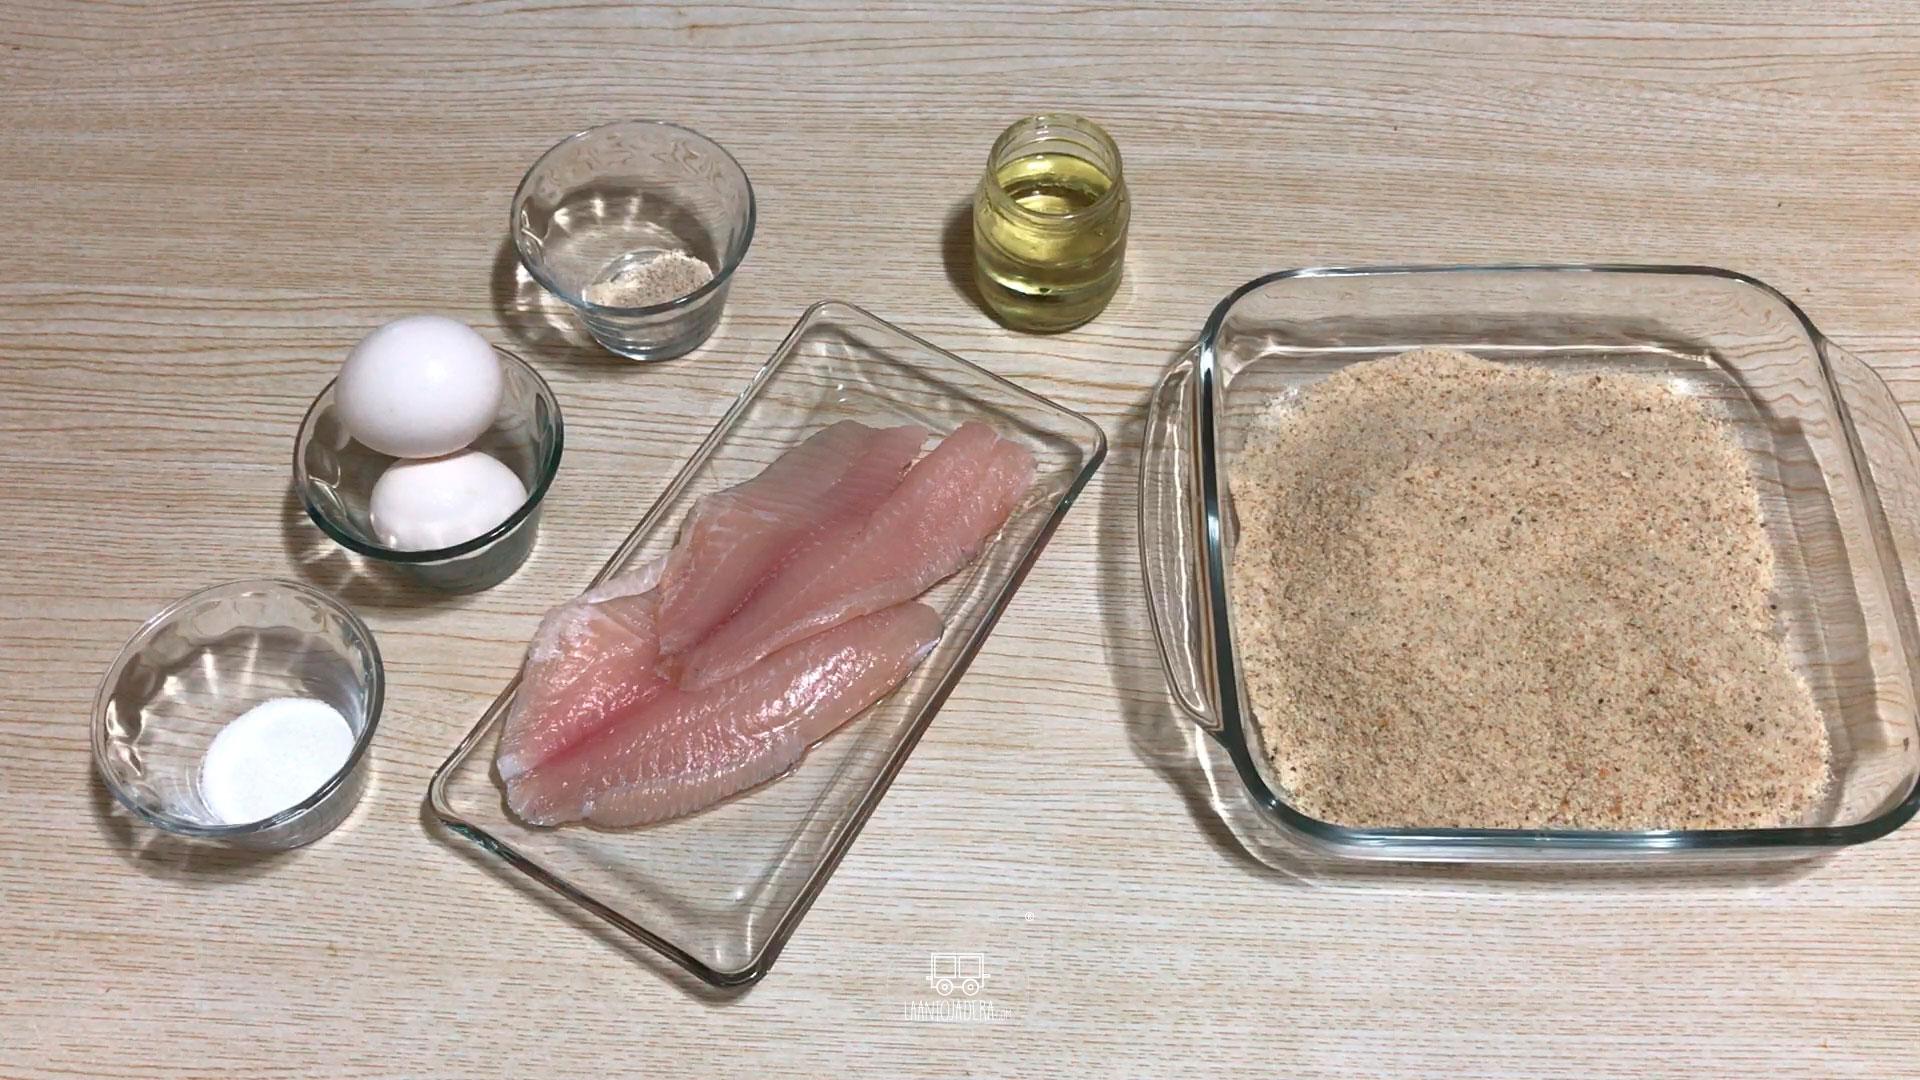 La Antojadera | Filete de Pescado Empanizado